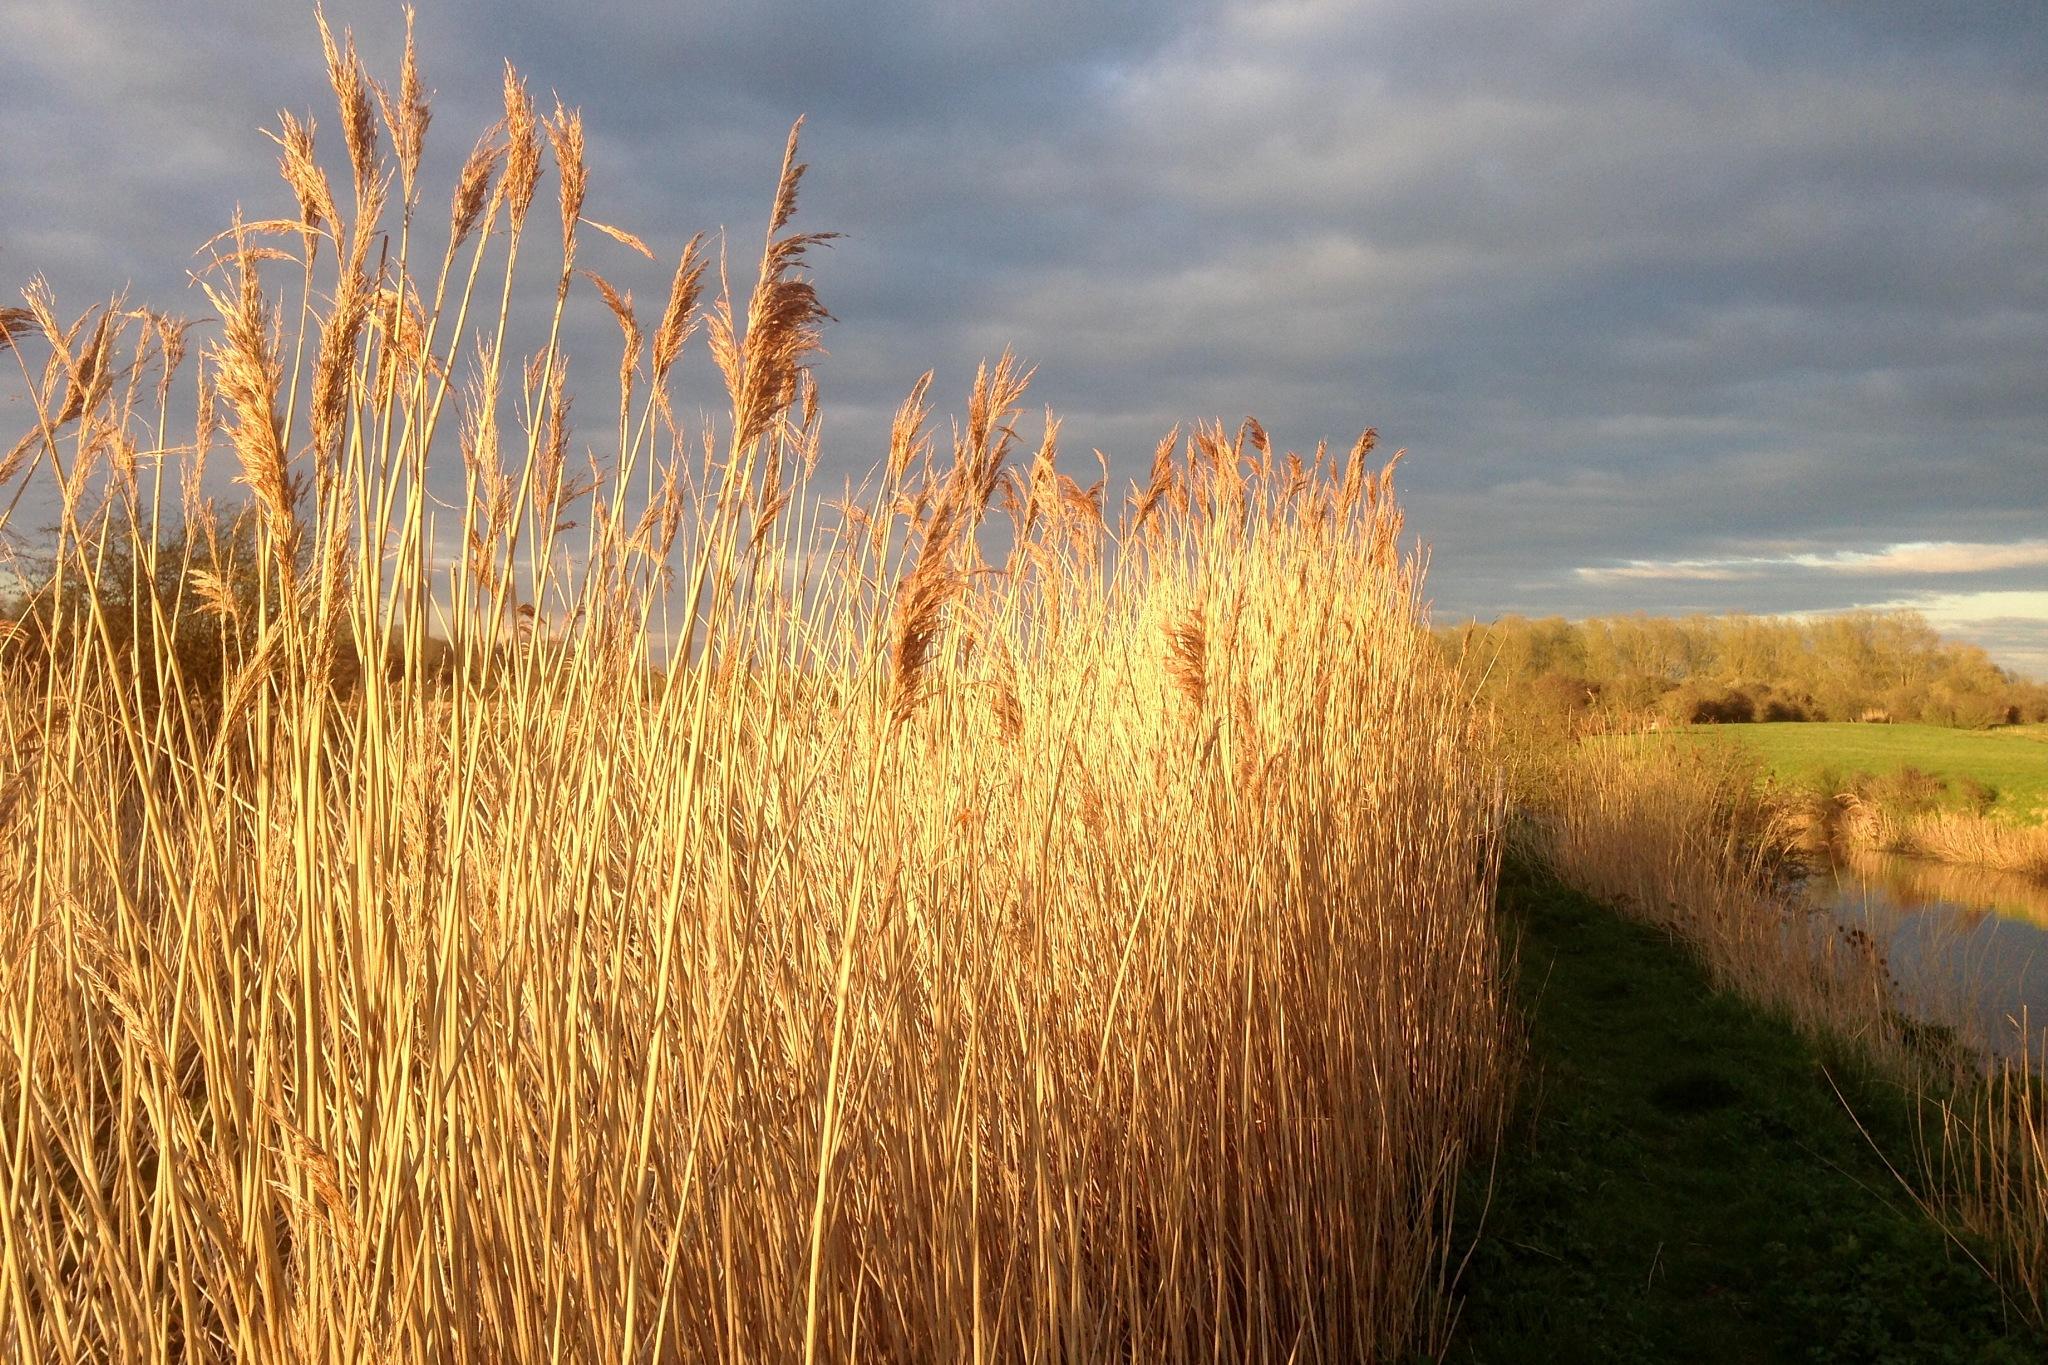 Reeds 2 by Steven James Homewood